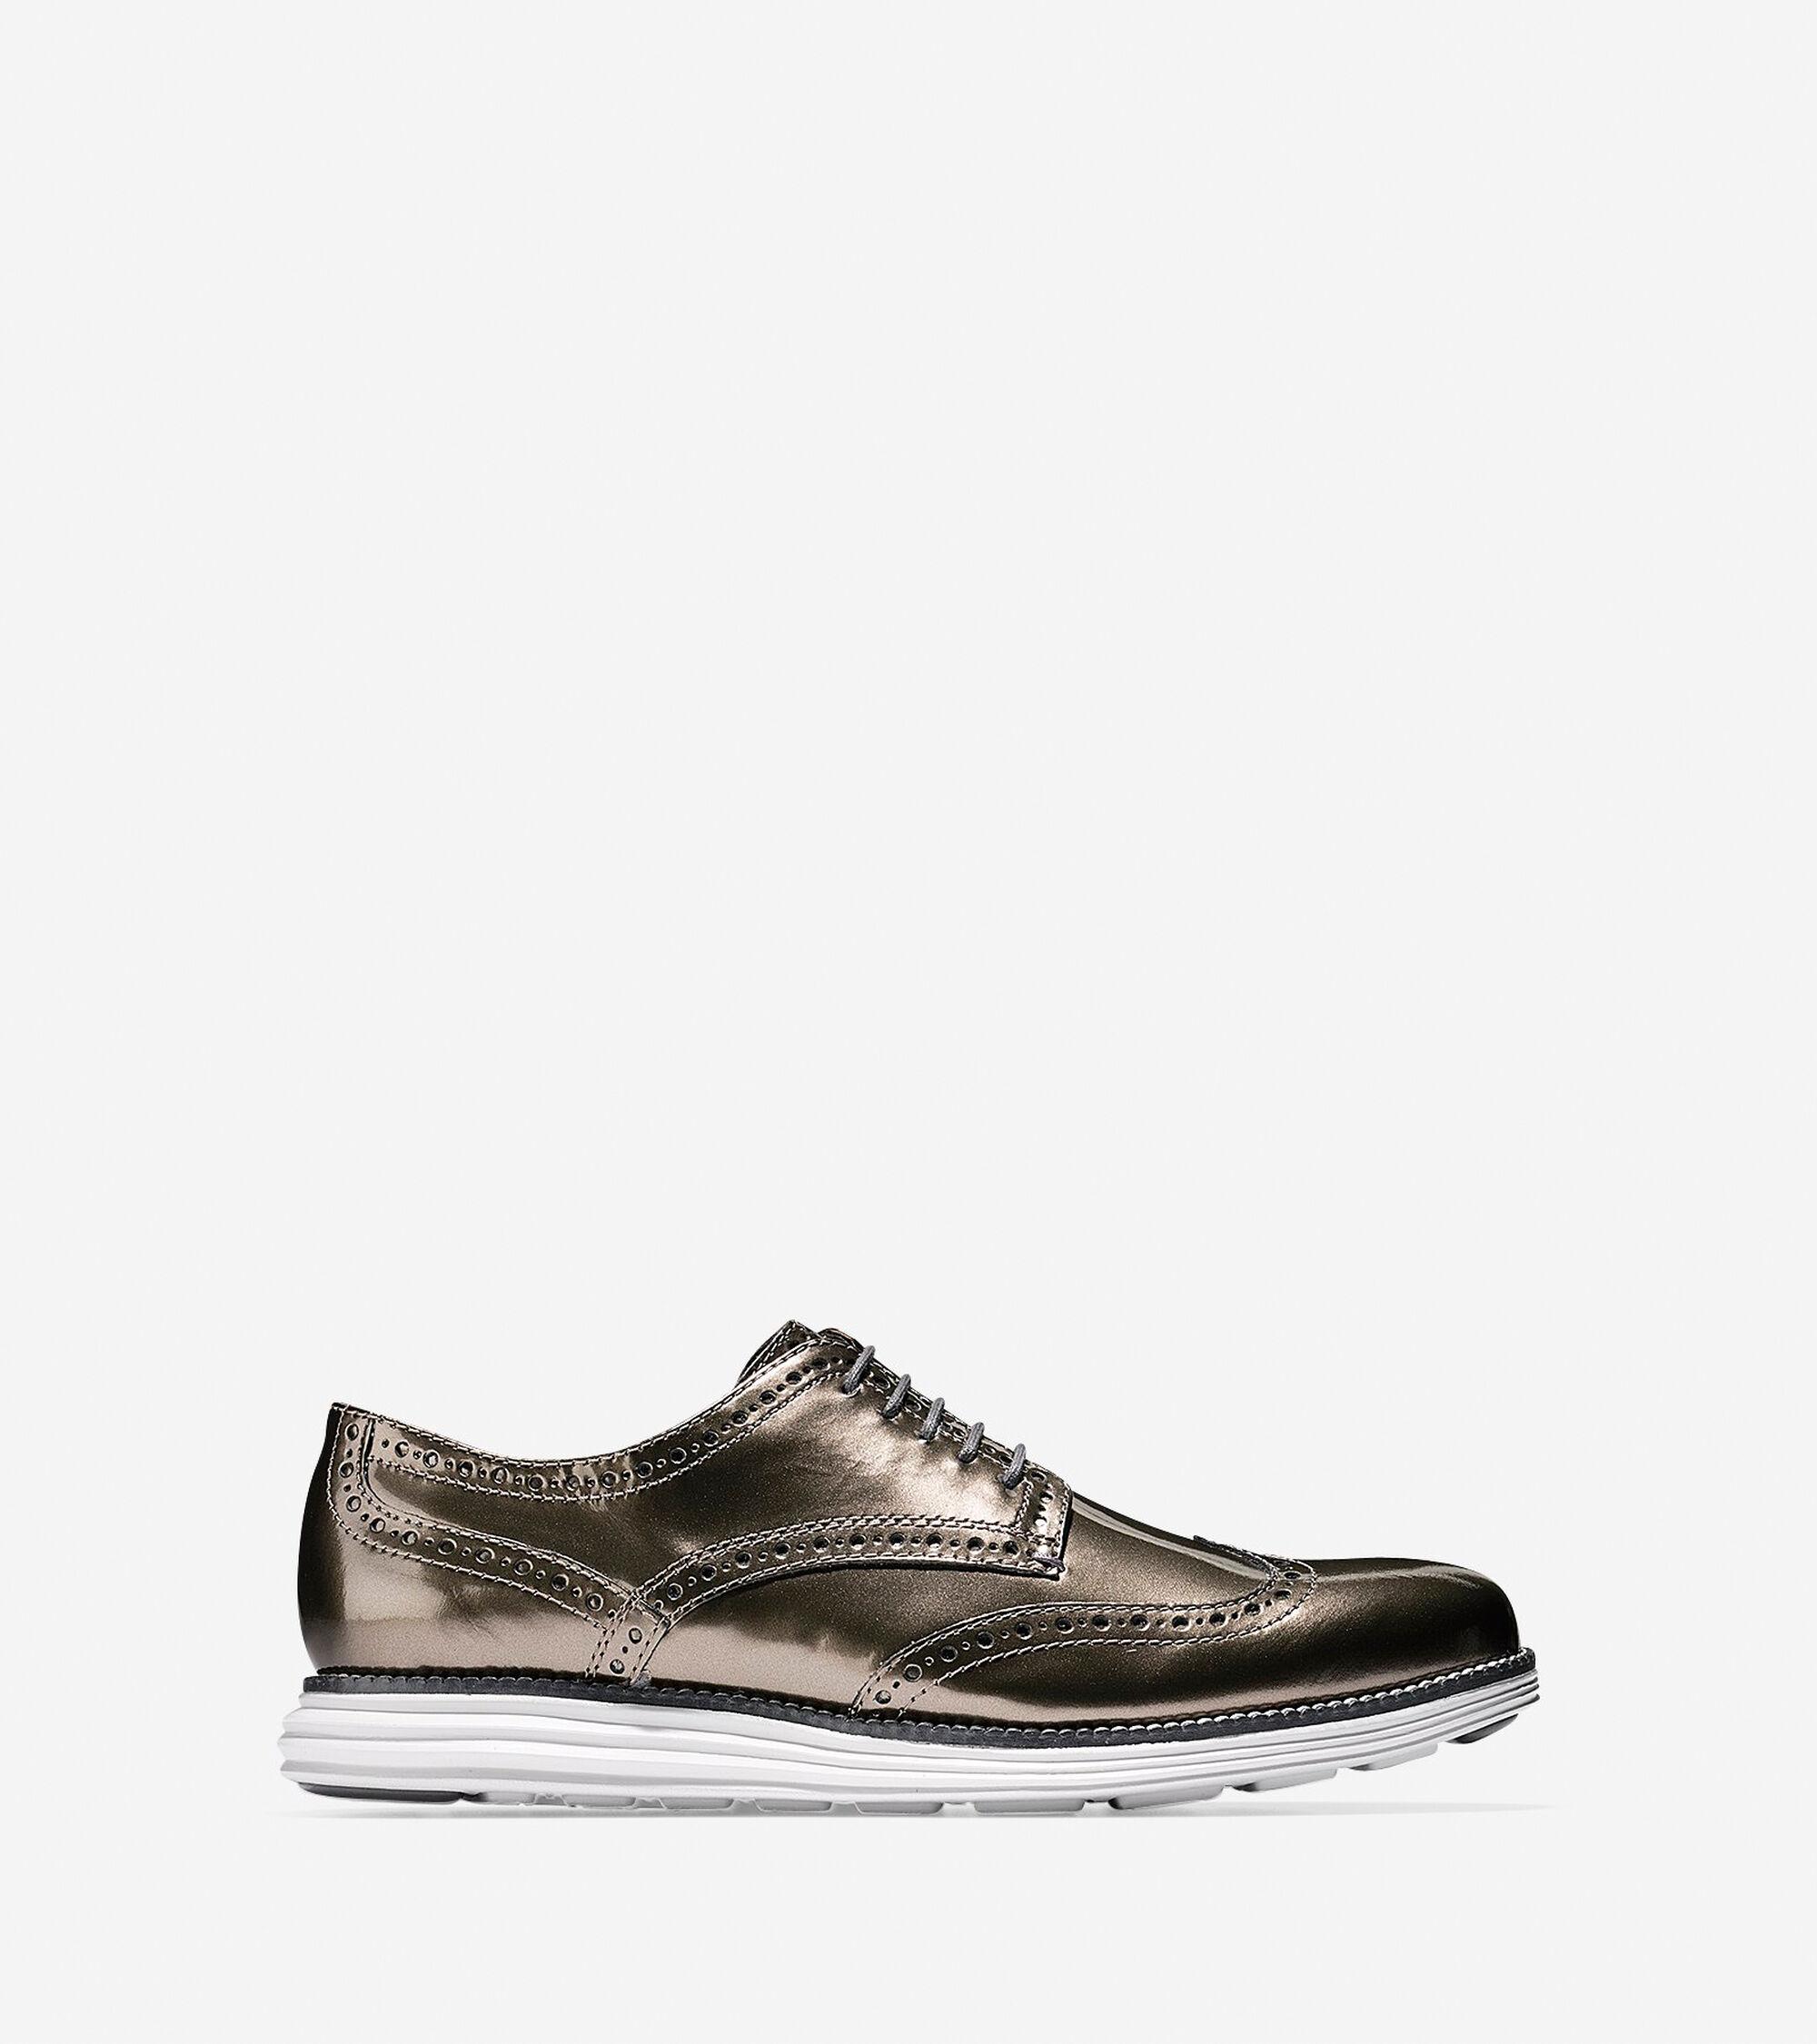 Mens Cole Haan OriginalGrand Wingtip Oxford Shoes